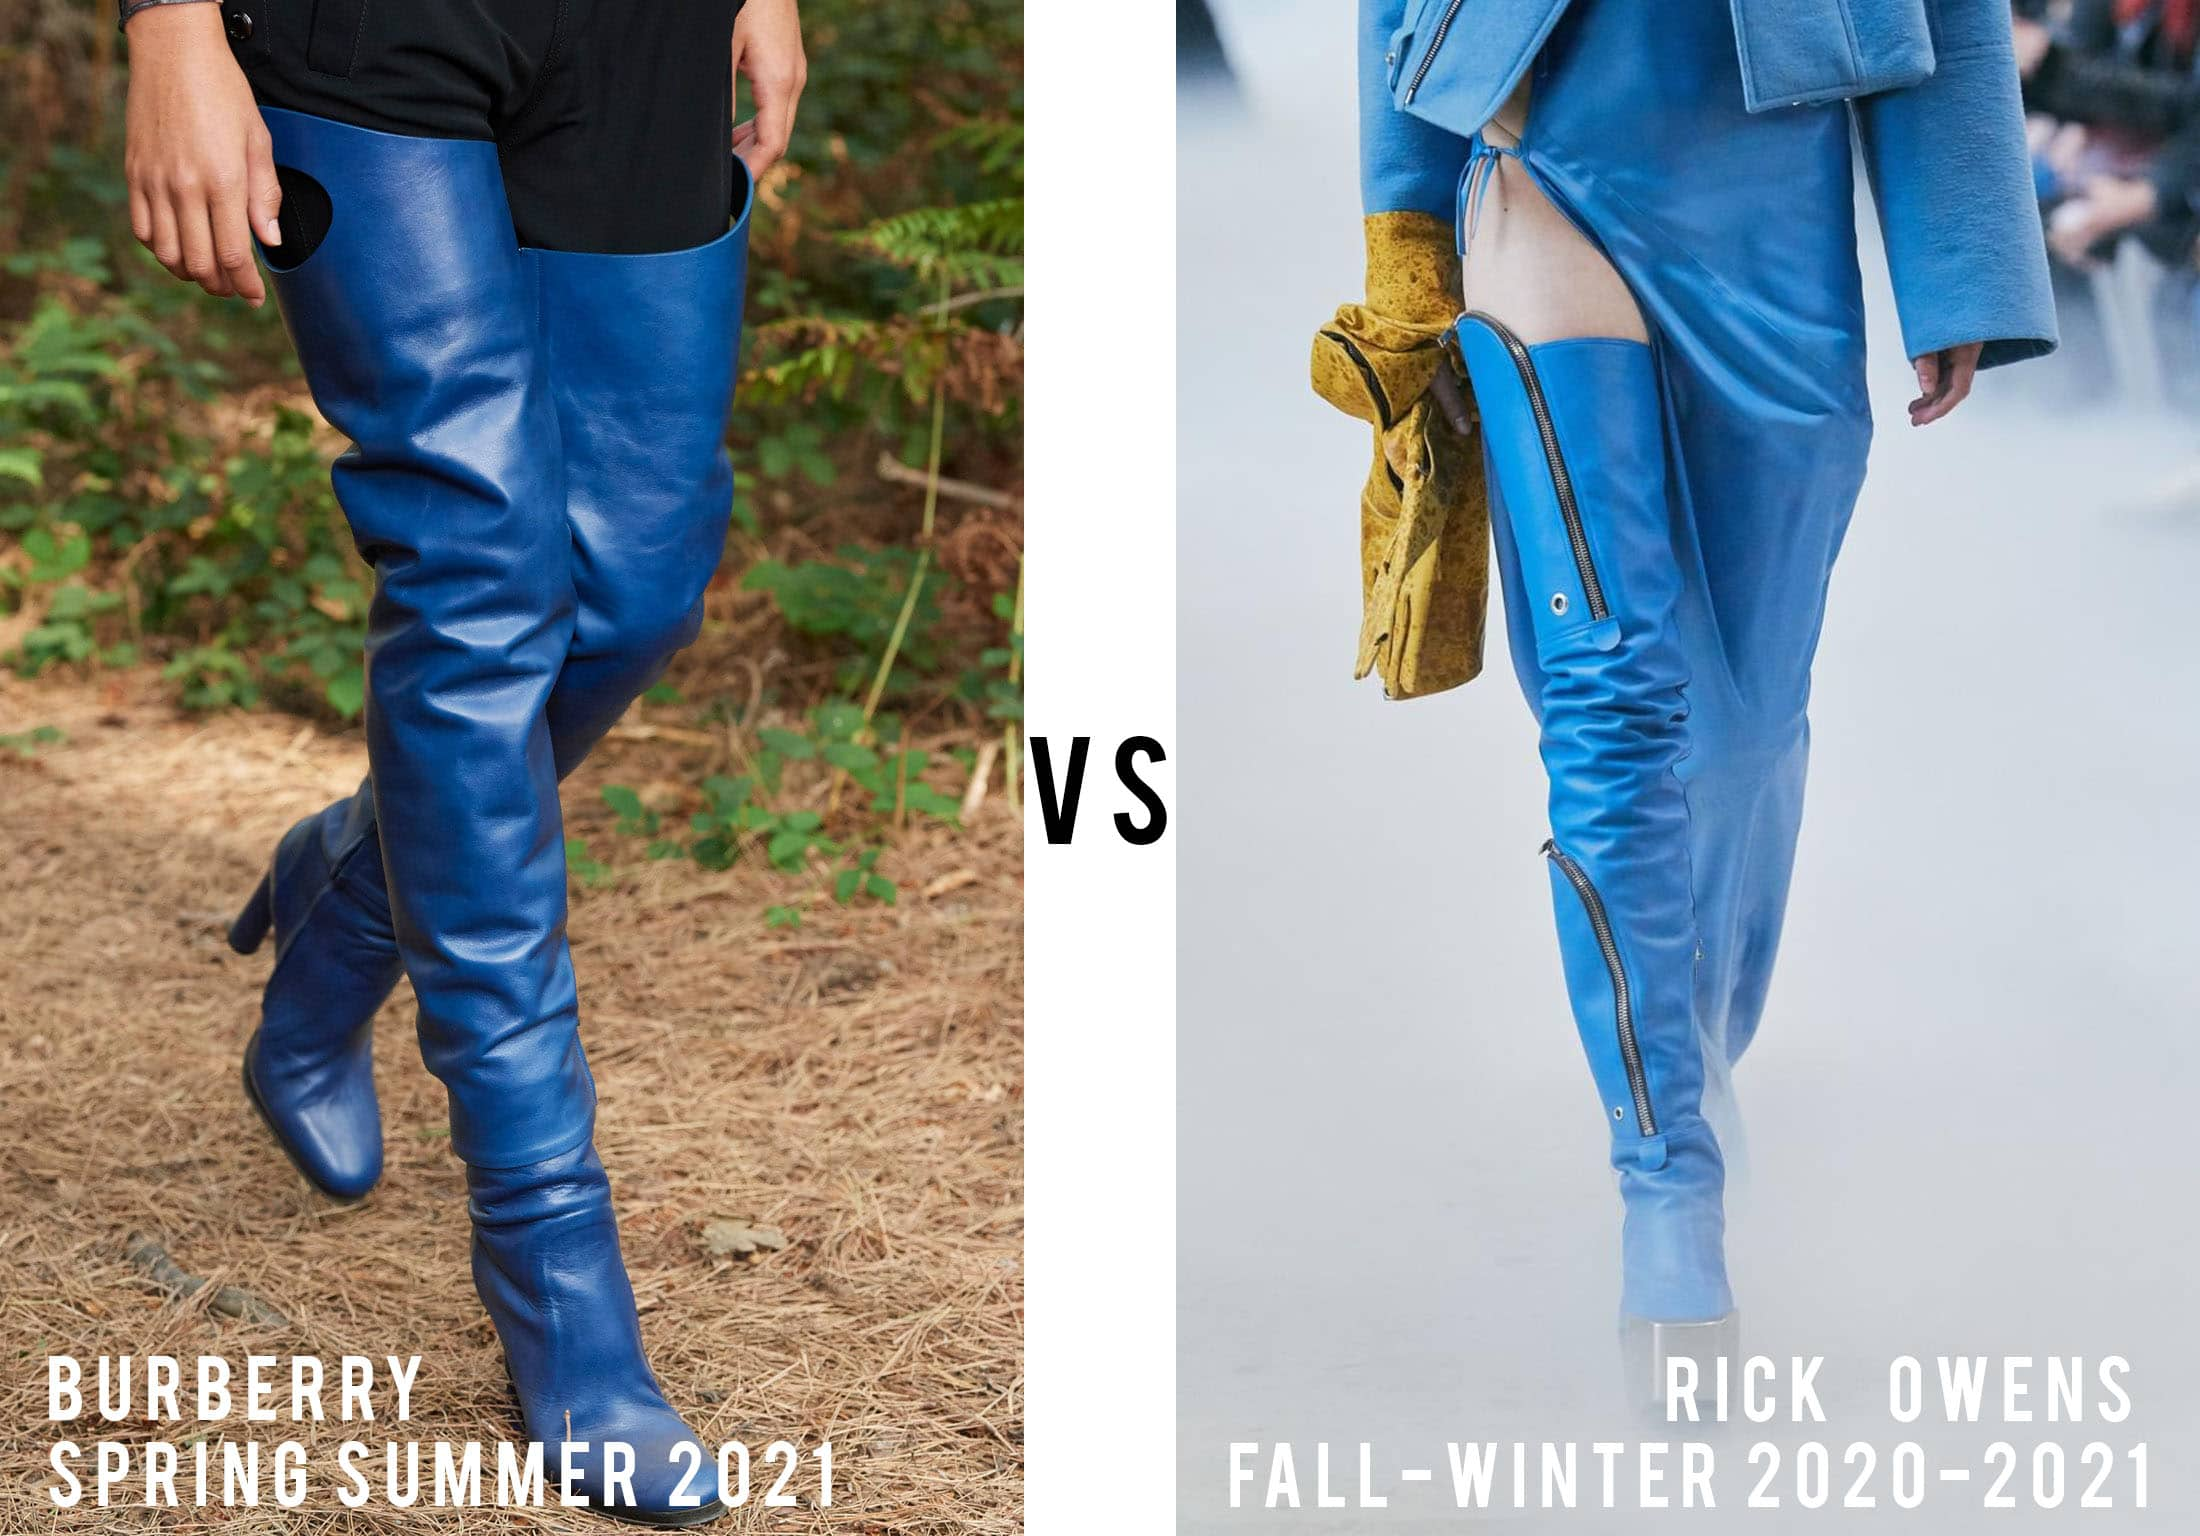 Burberry Spring Summer 2021 vs Rick Owens Fall-Winter 2020-2021